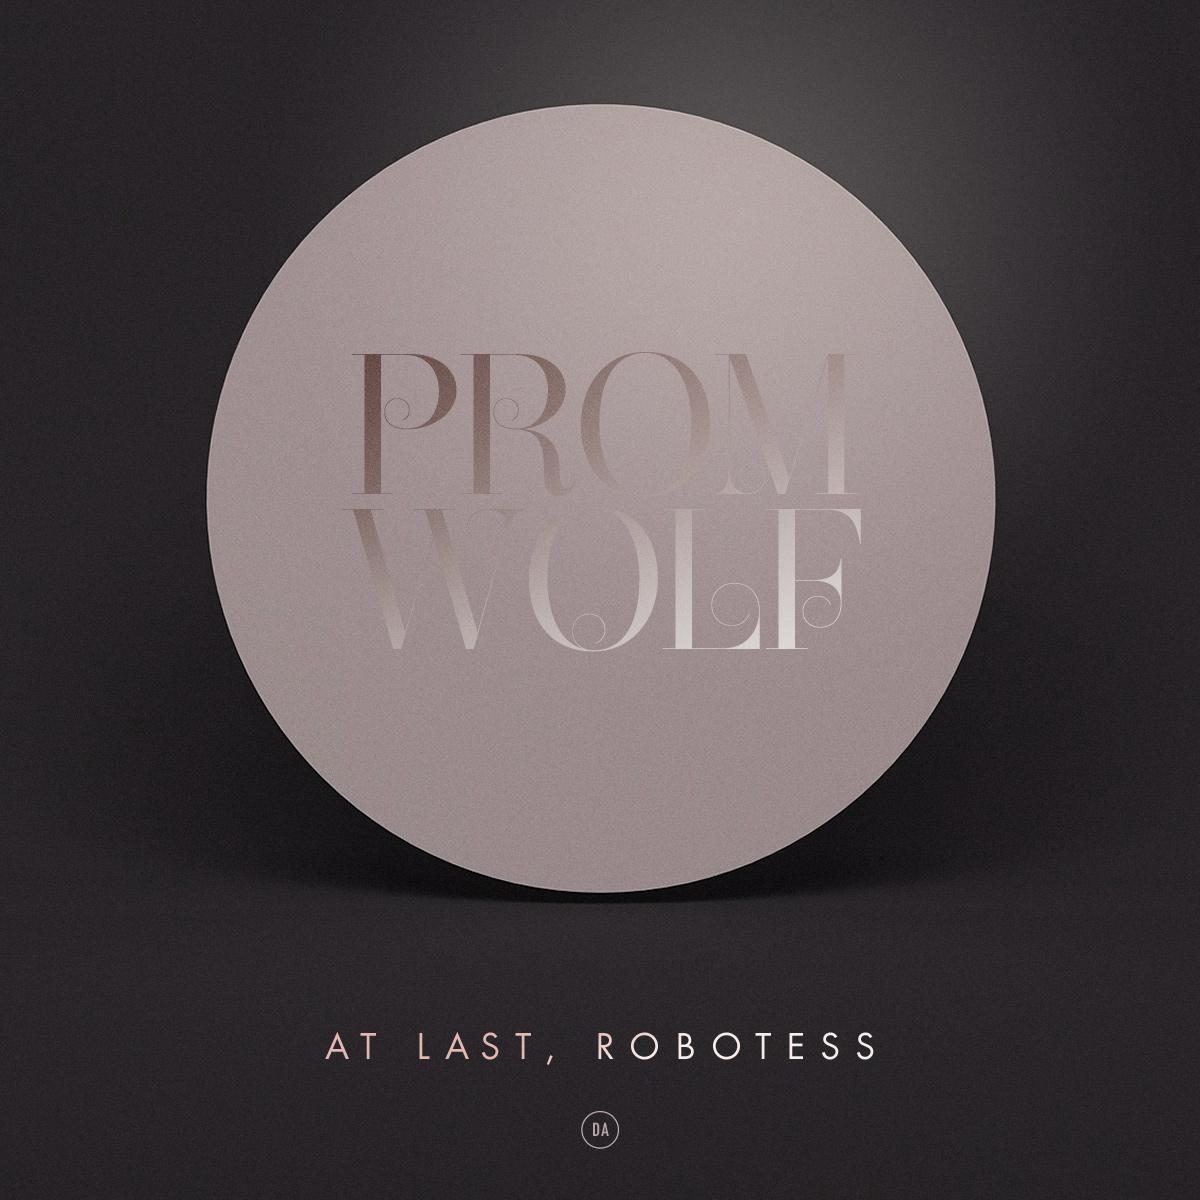 Promwolf — At last, Robotess